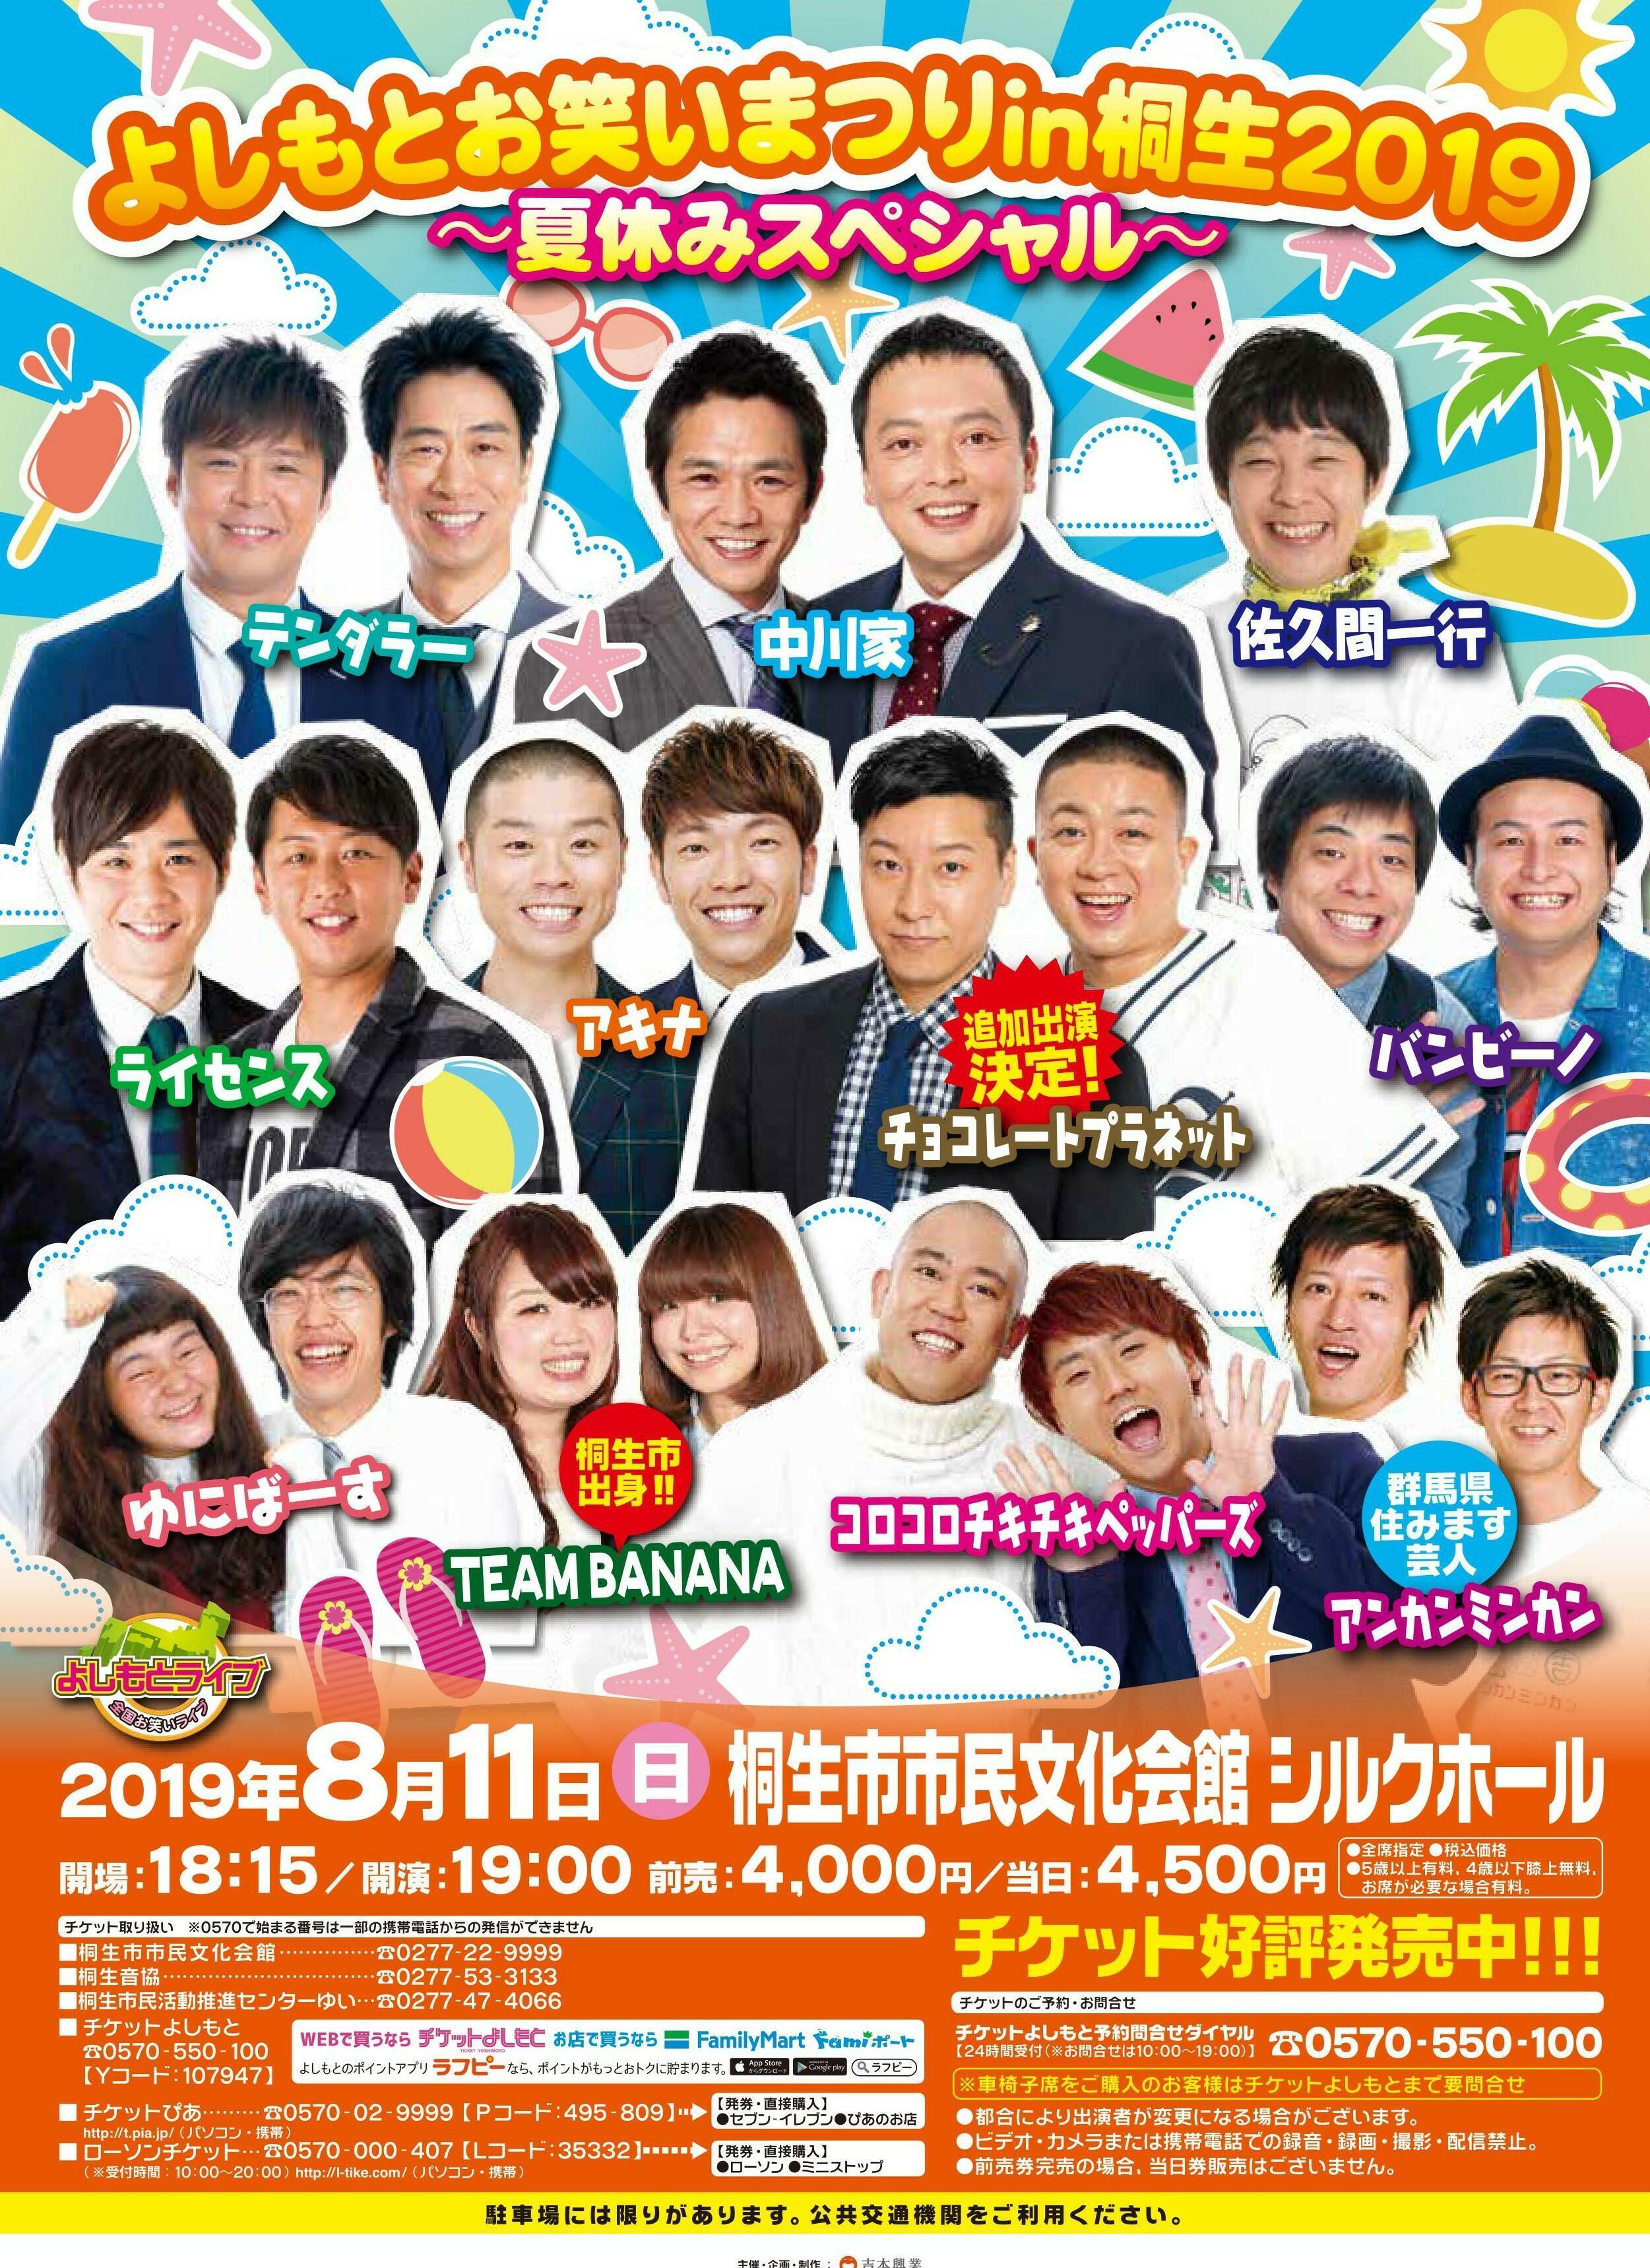 http://www.syumatsu.jp/20190716204957-f5b22a58188bb6a2a0e8be267ff6453093c90666.jpg